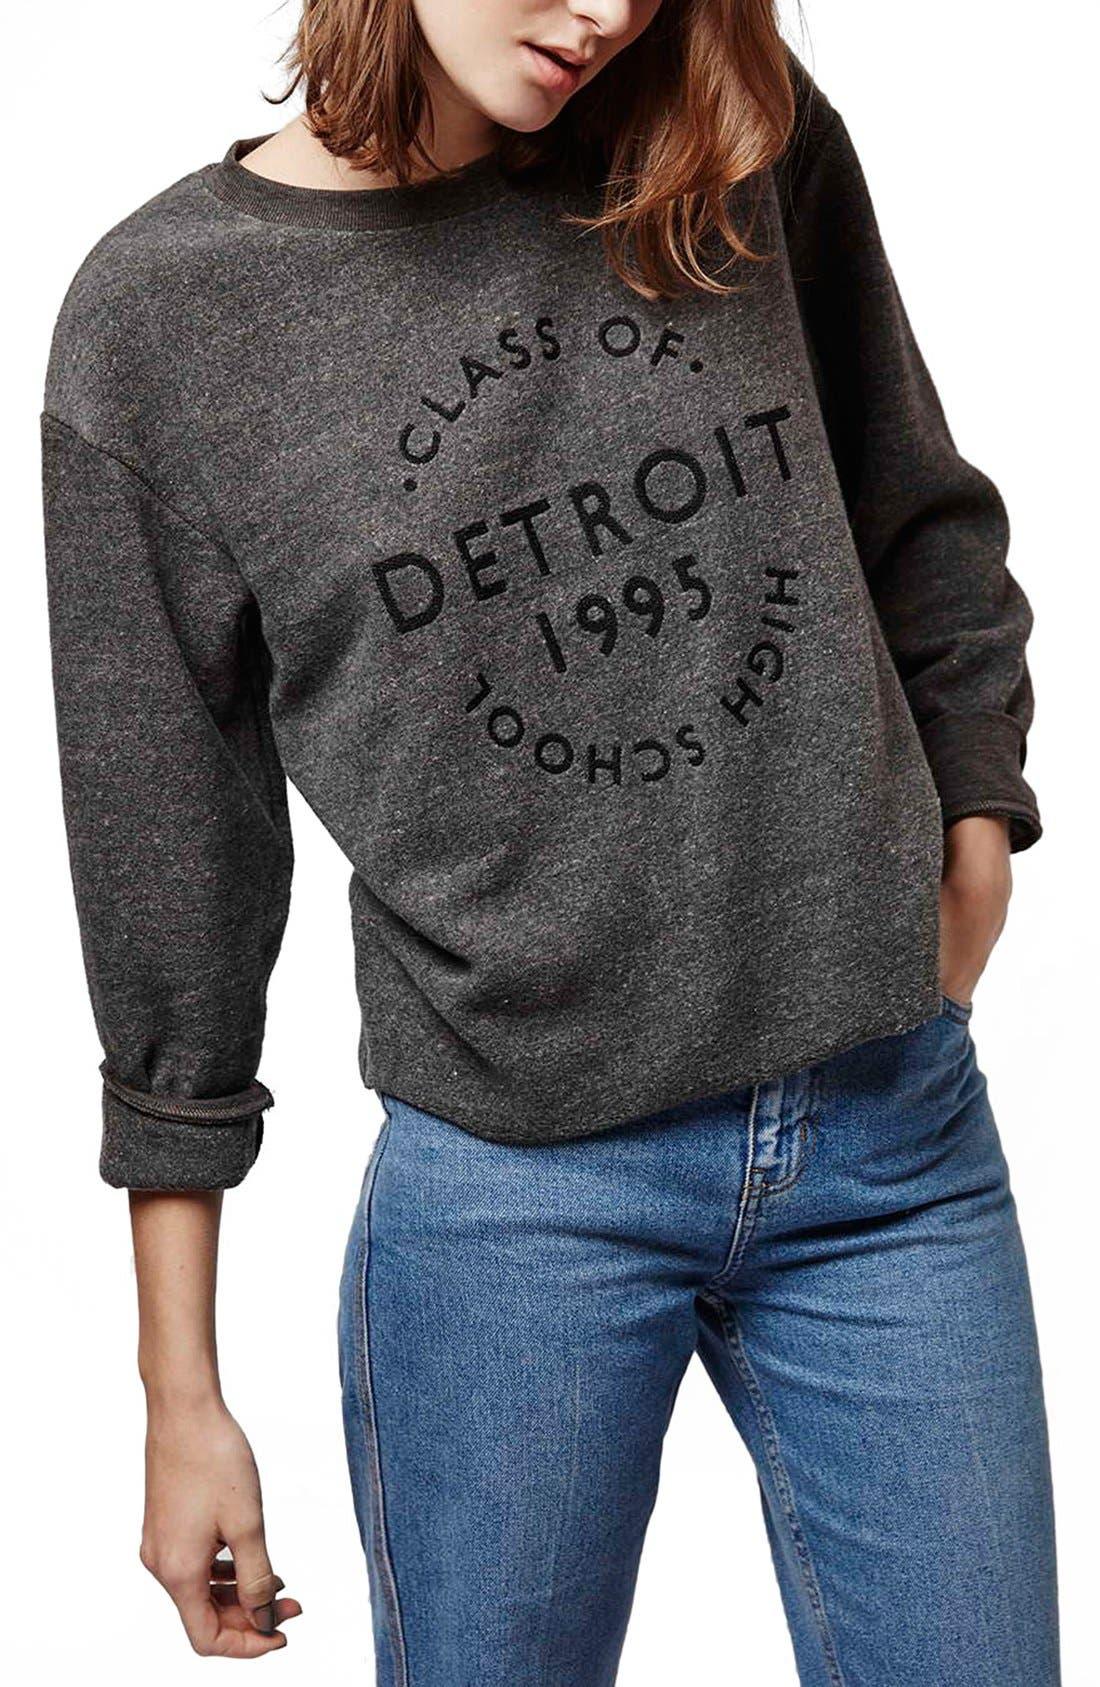 Alternate Image 1 Selected - Topshop 'Detroit' Brushed Crewneck Sweatshirt